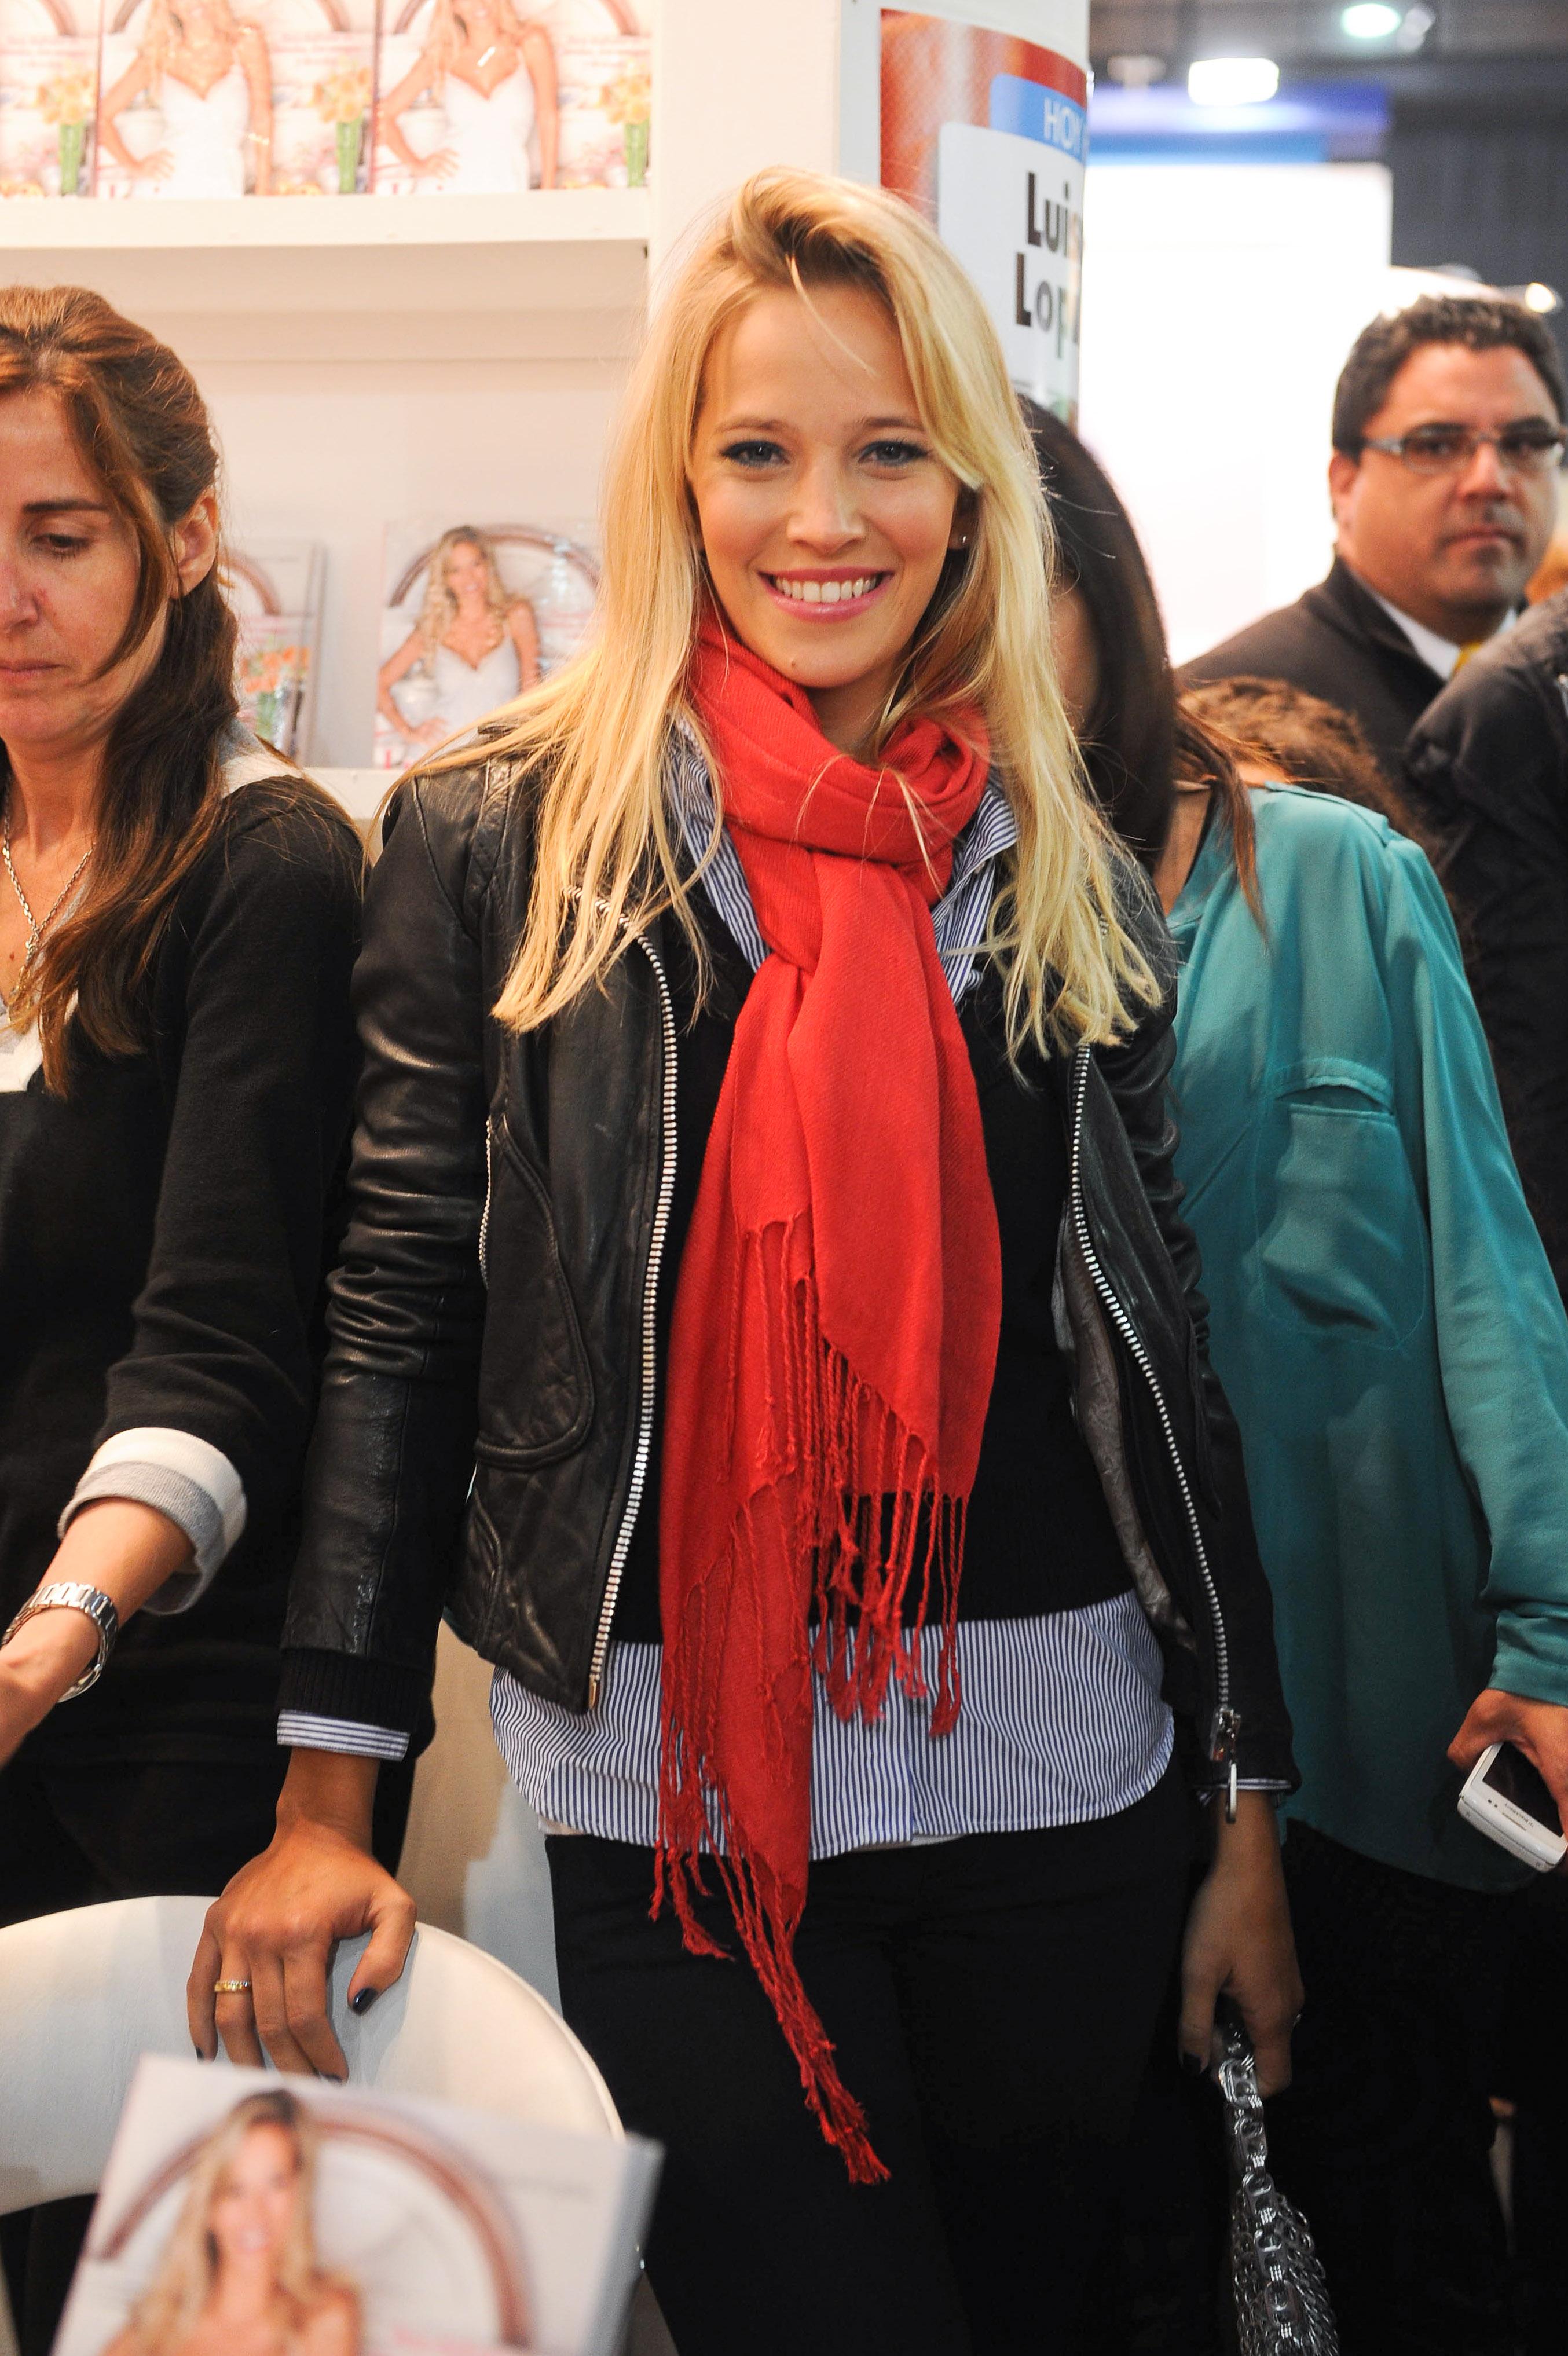 General photo of Luisana Lopilato